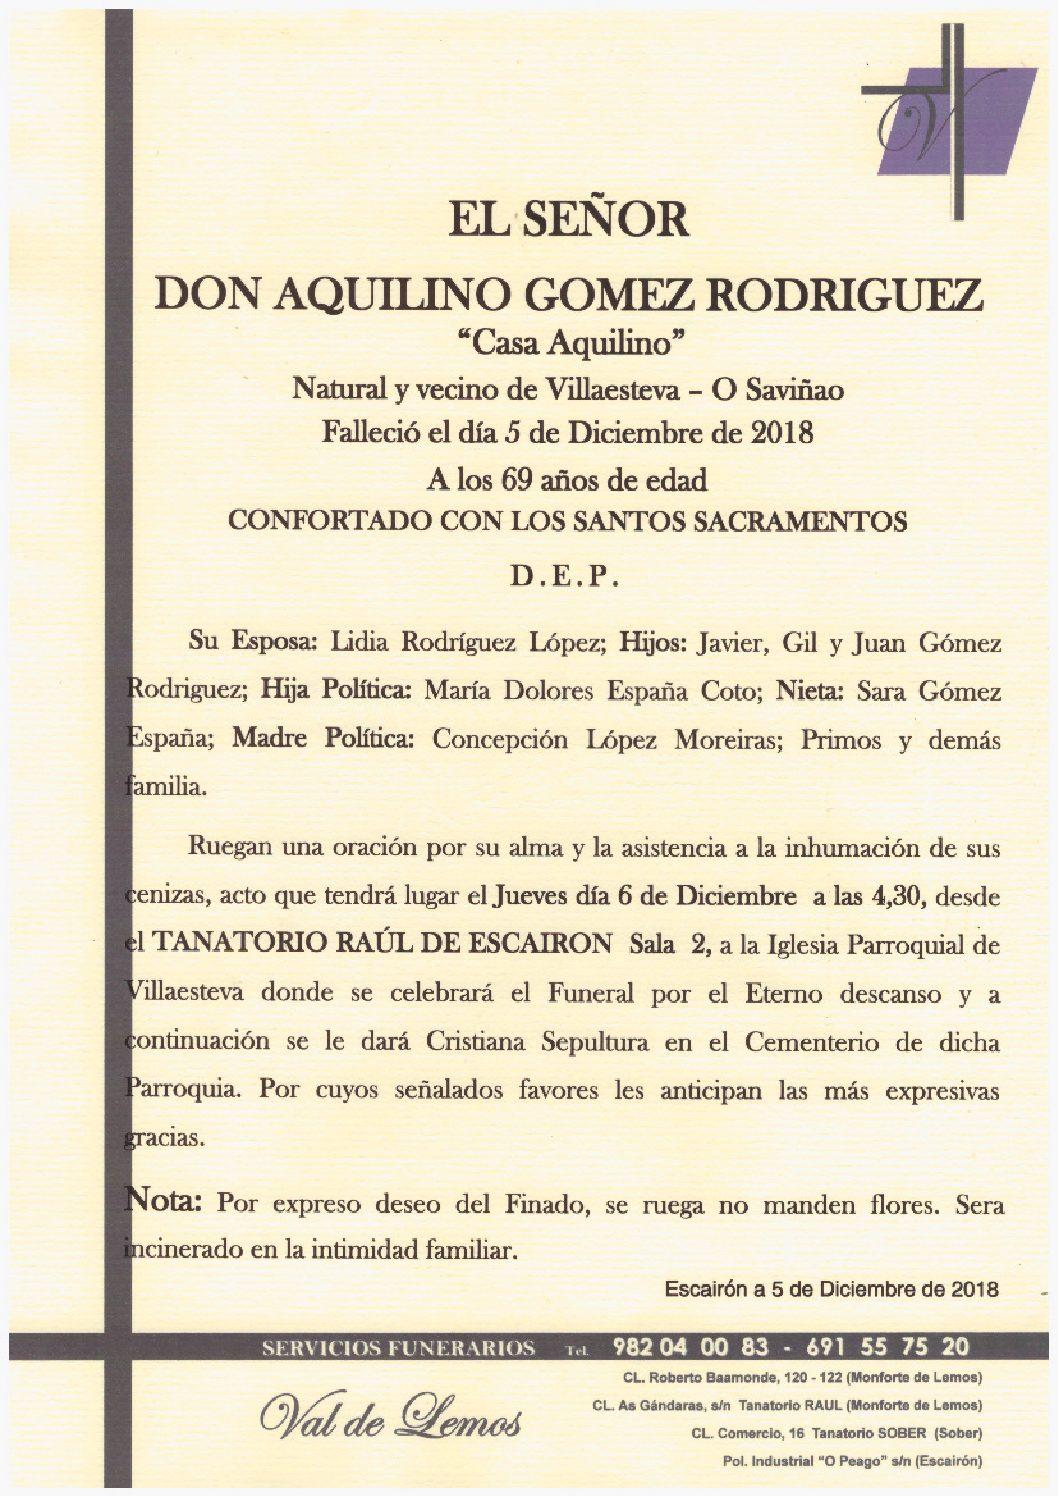 DON AQUILINO GOMEZ RODRIGUEZ